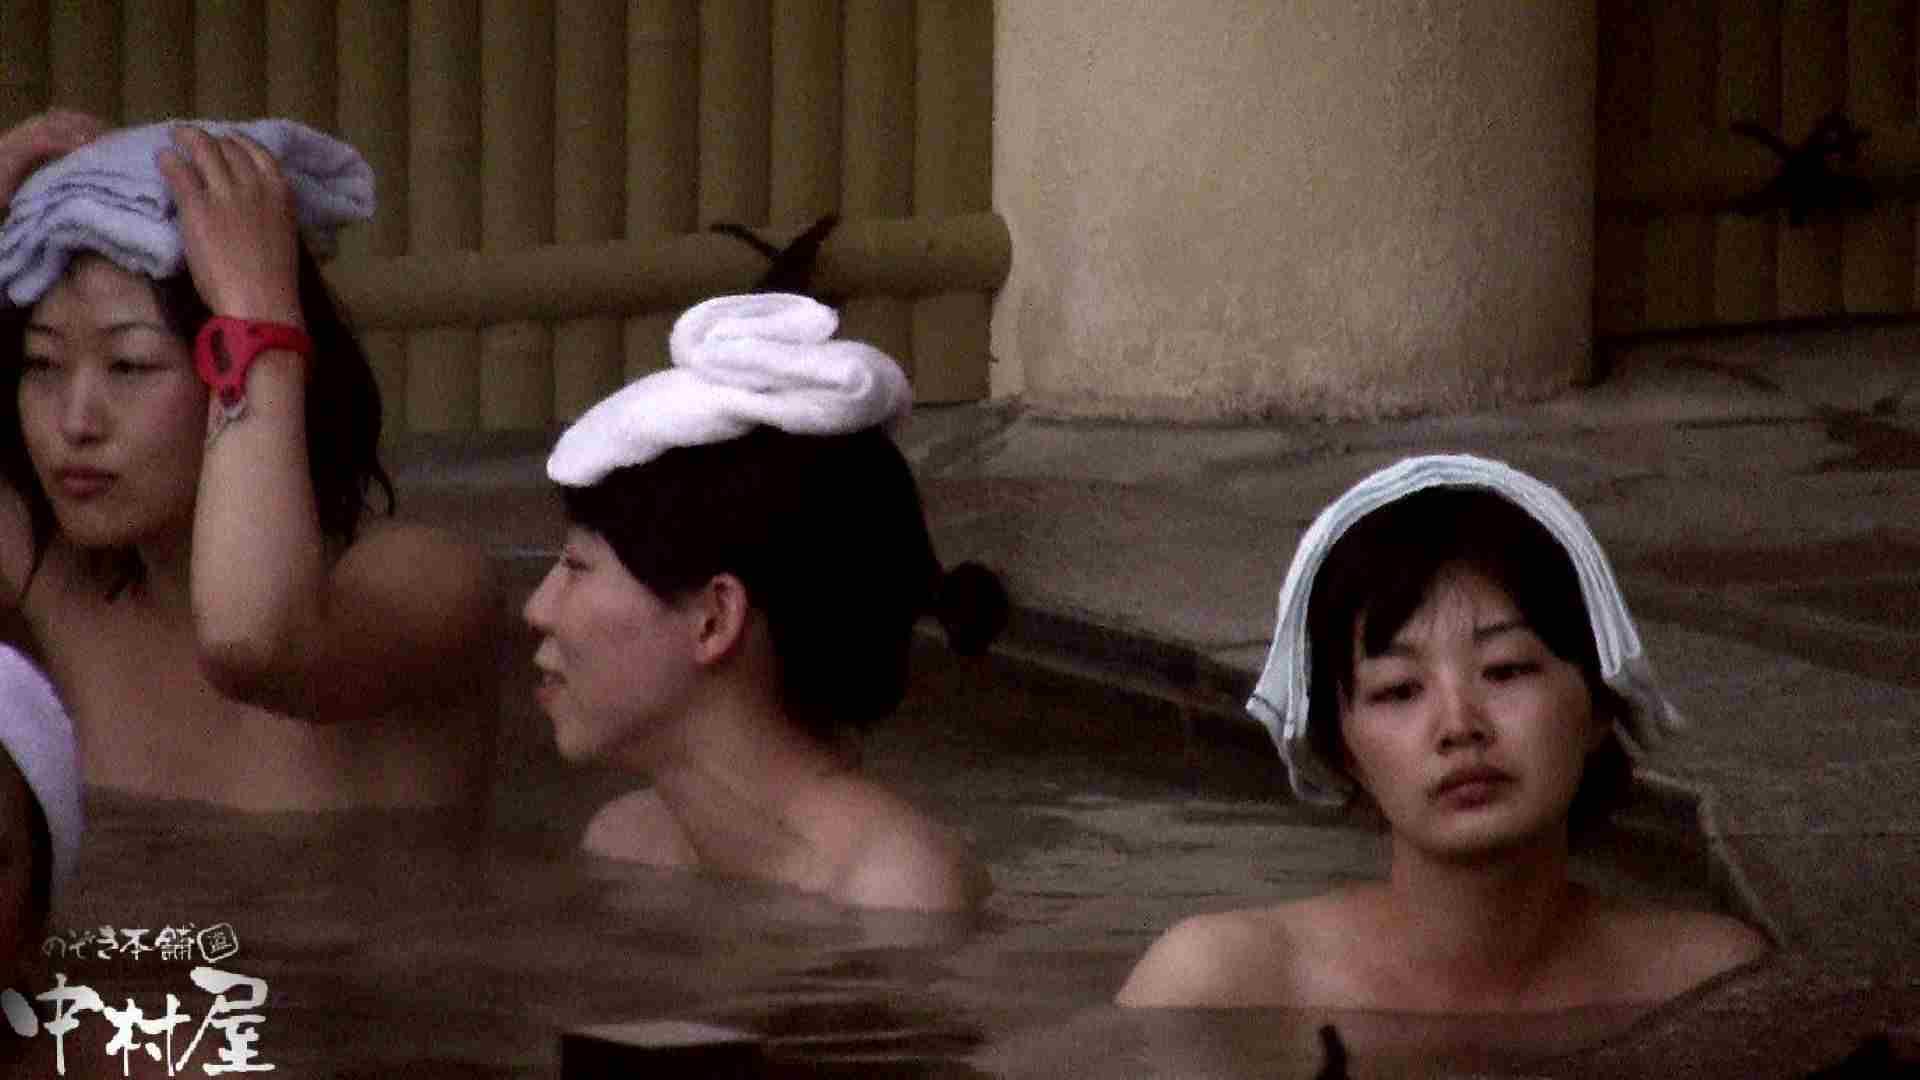 Aquaな露天風呂Vol.916 盗撮映像  73Pix 44